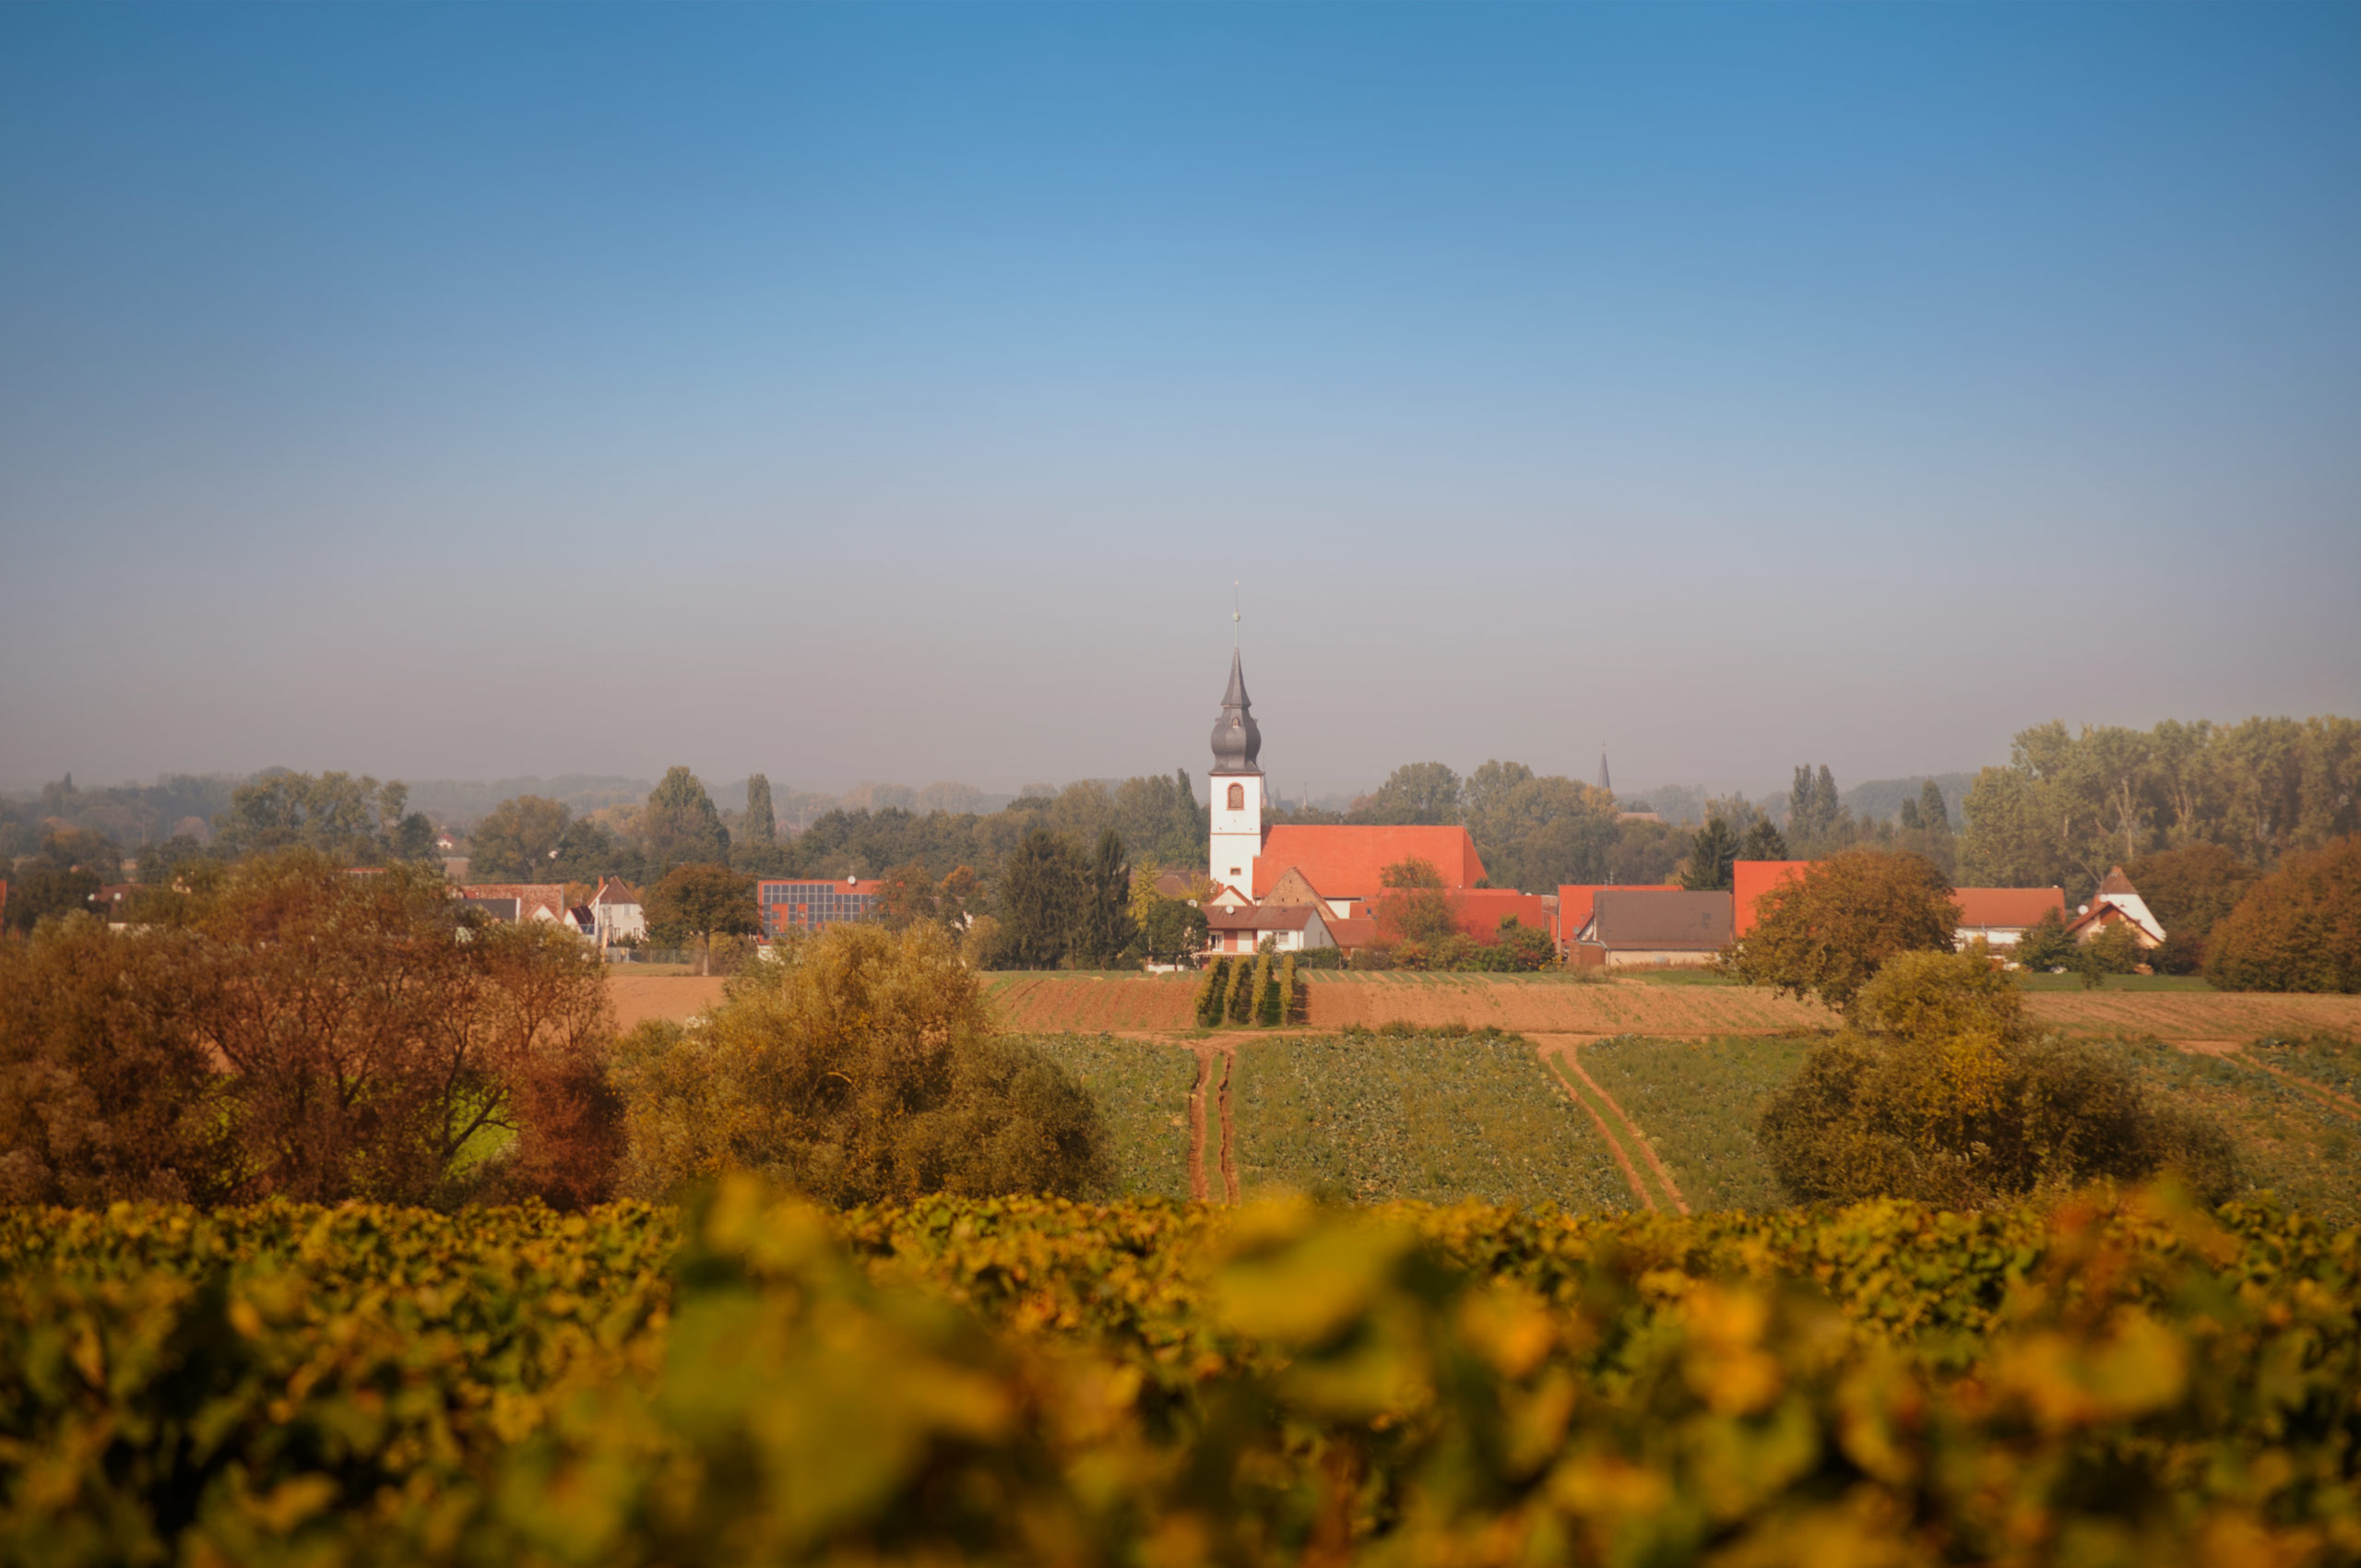 Hintergrundbild Panorama Freisbach